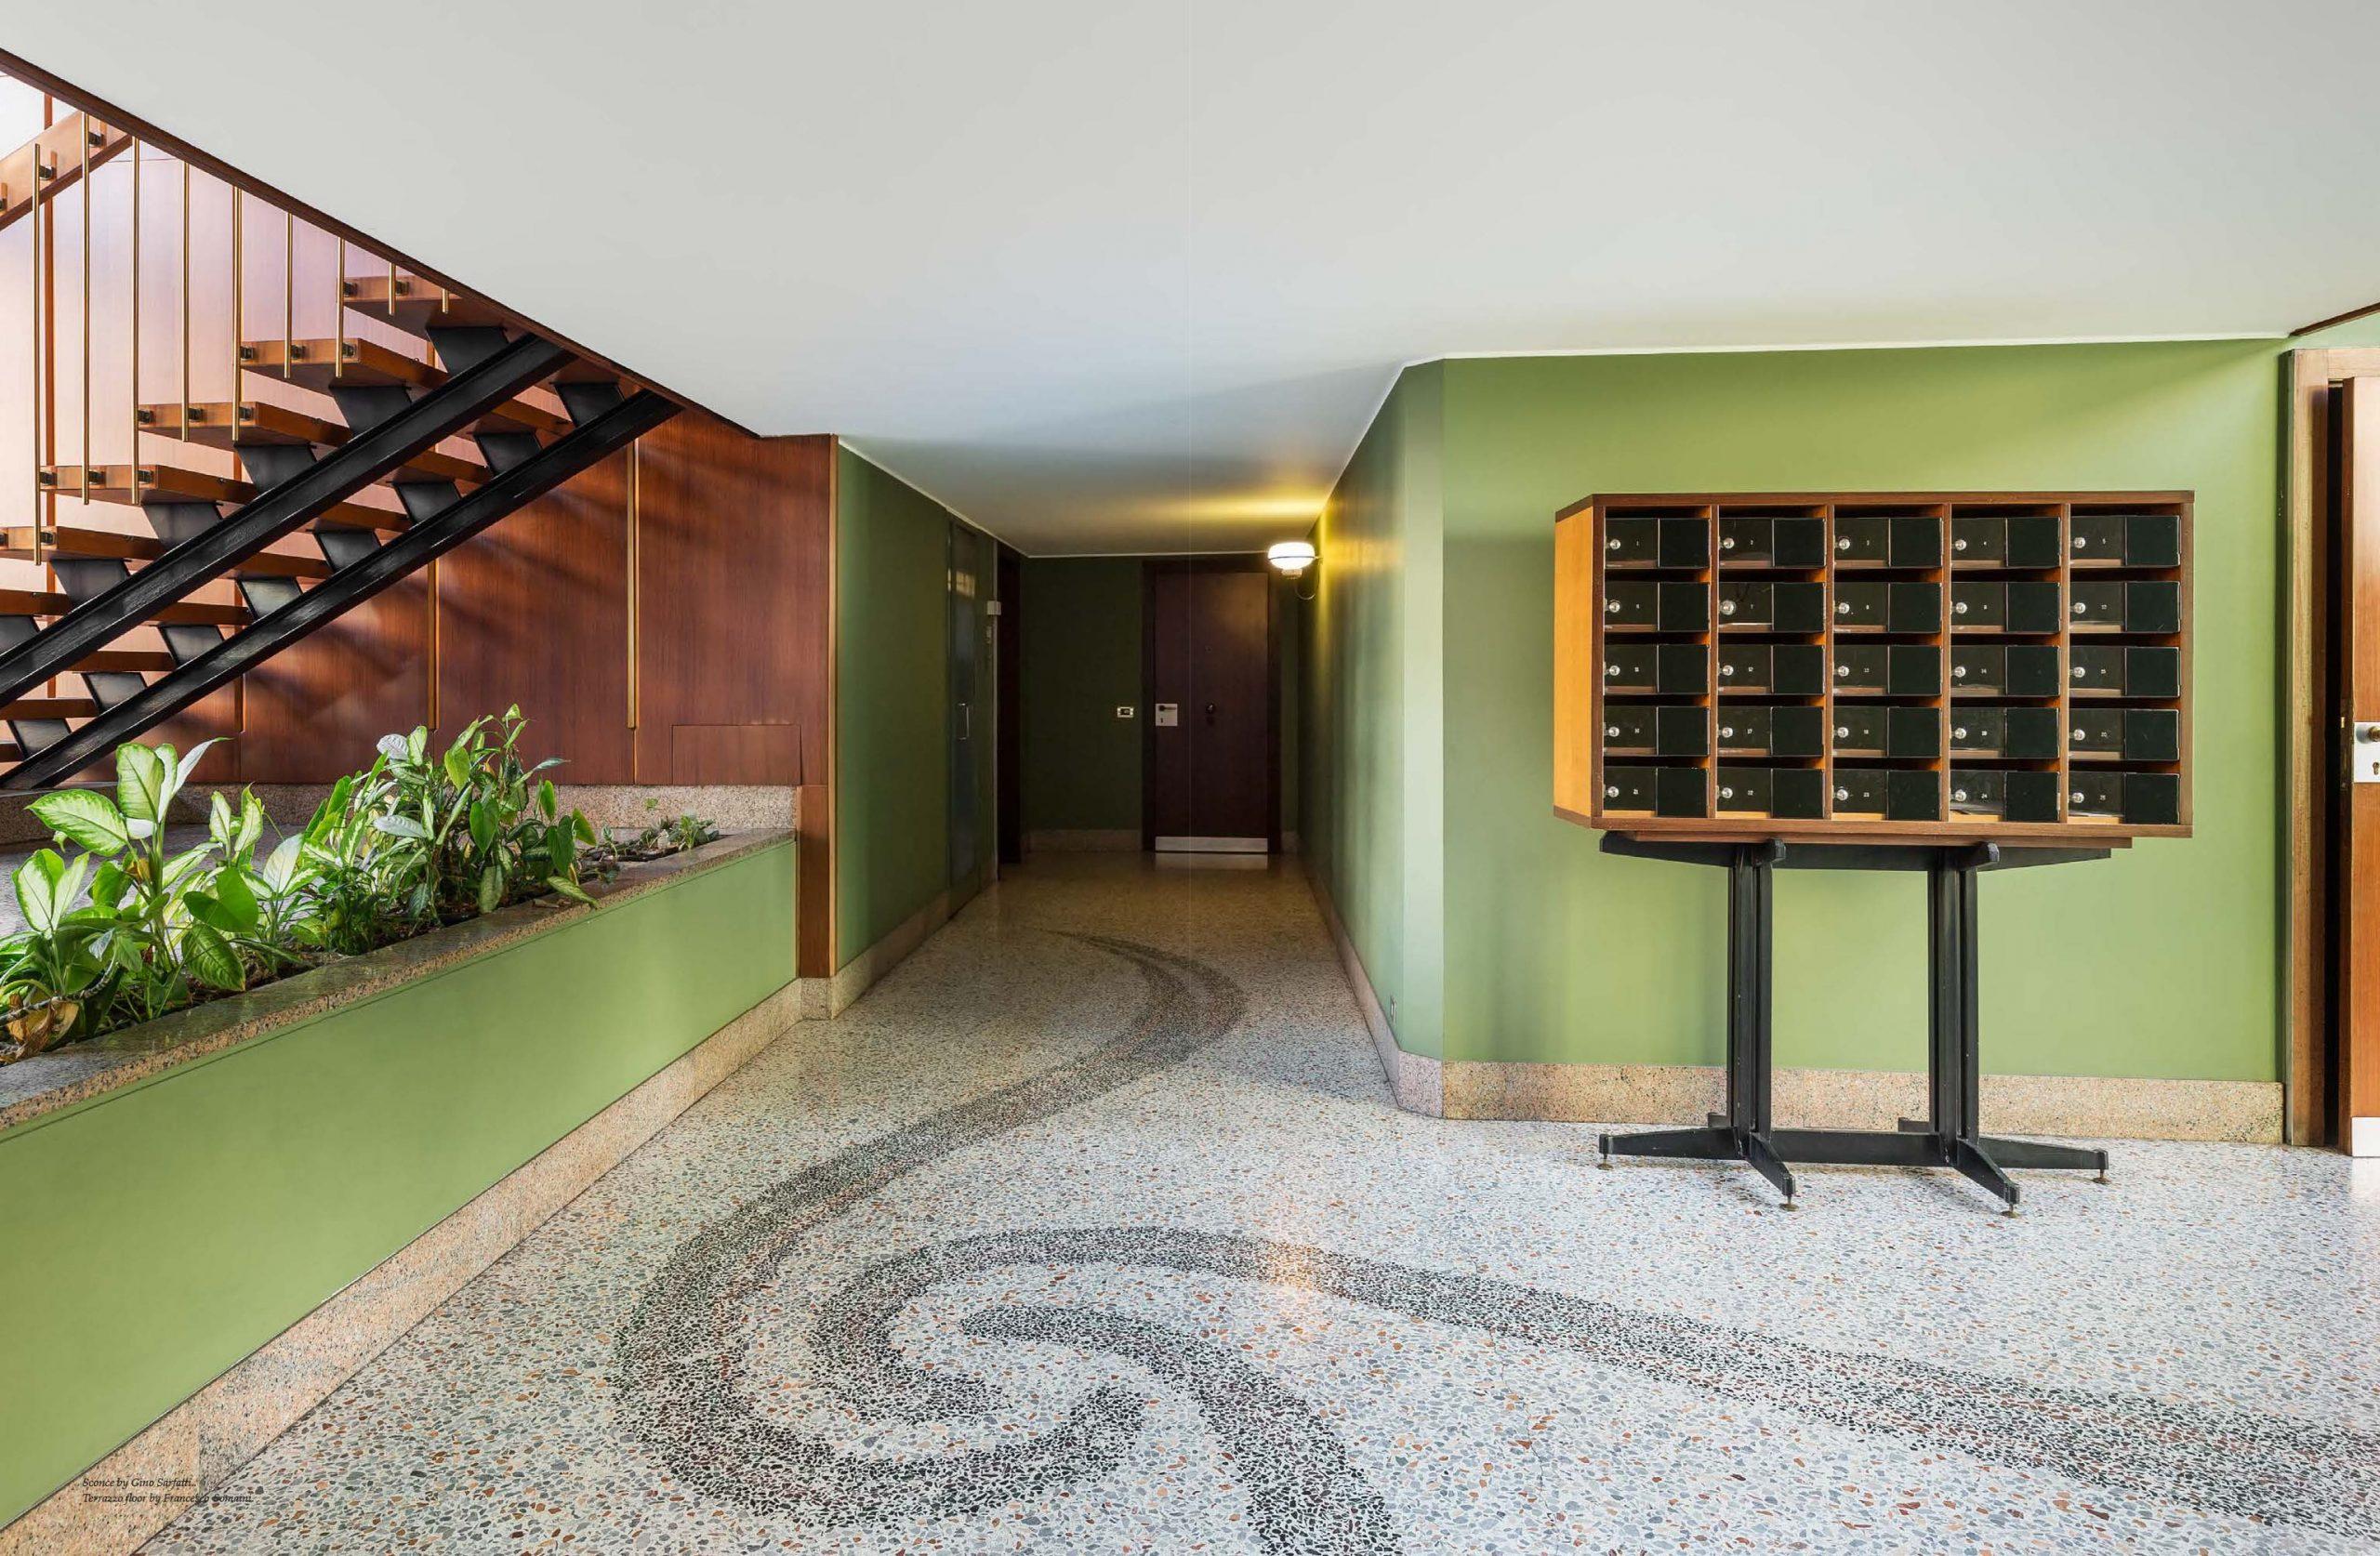 nicoletta-dalfino-karl-kolbitz-entryways-of-milan-taschen-pp306-307-scaled